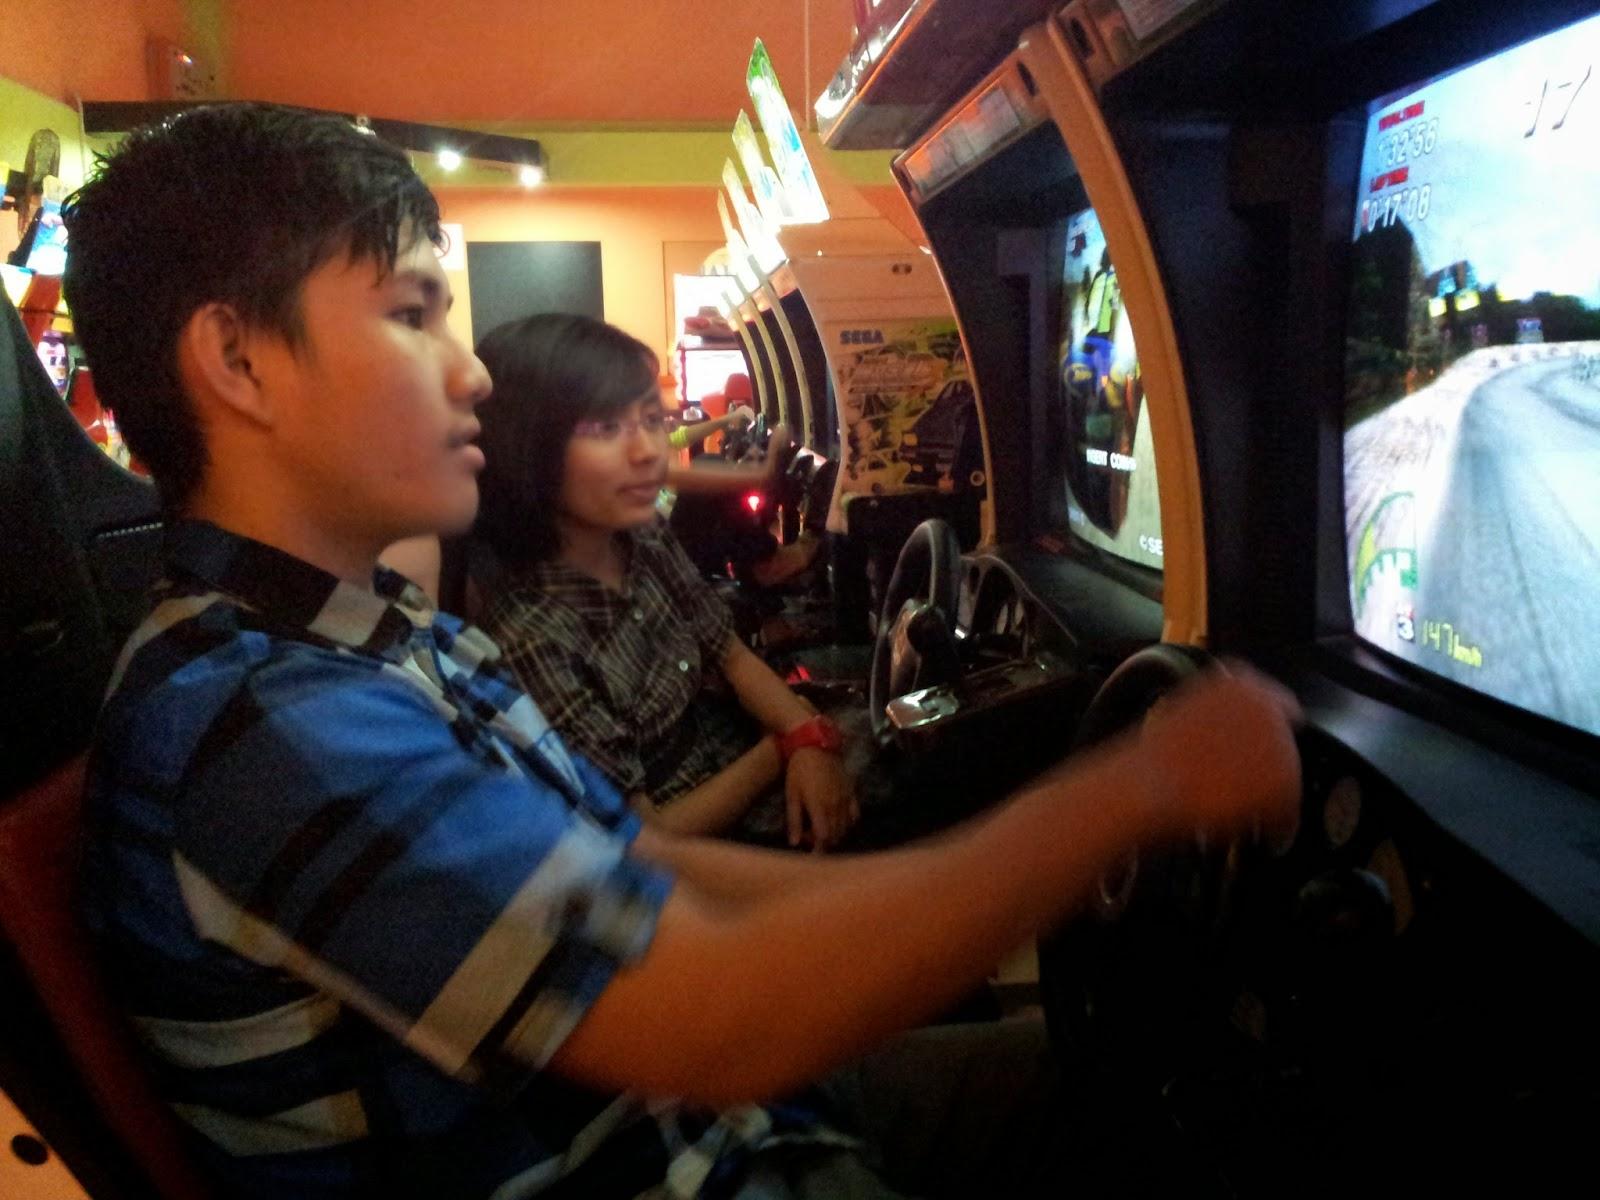 Misi Bintang Mencari Bintang : Main games lumba kereta